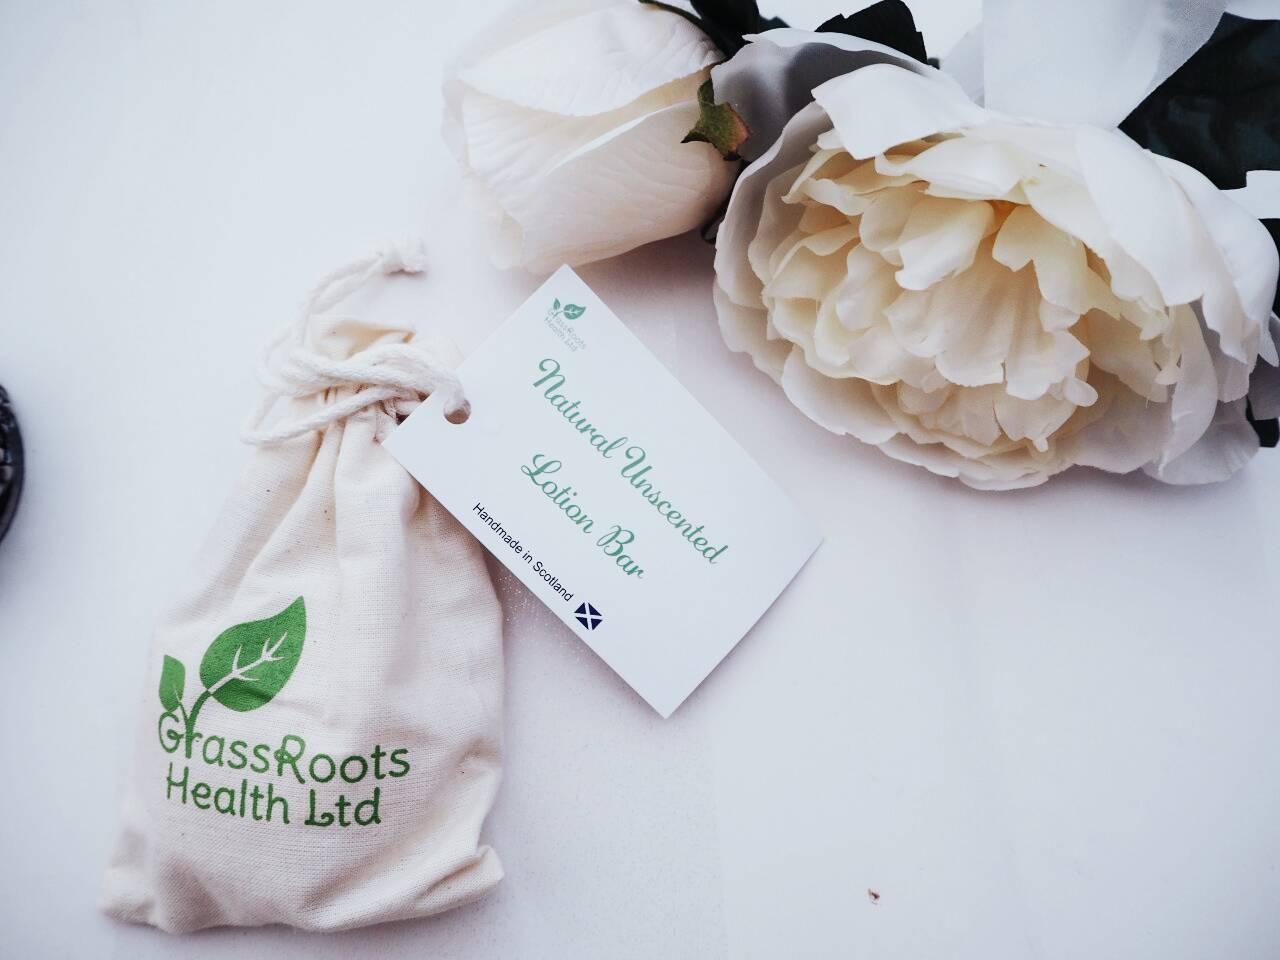 Grassroots Health Ltd Lotion